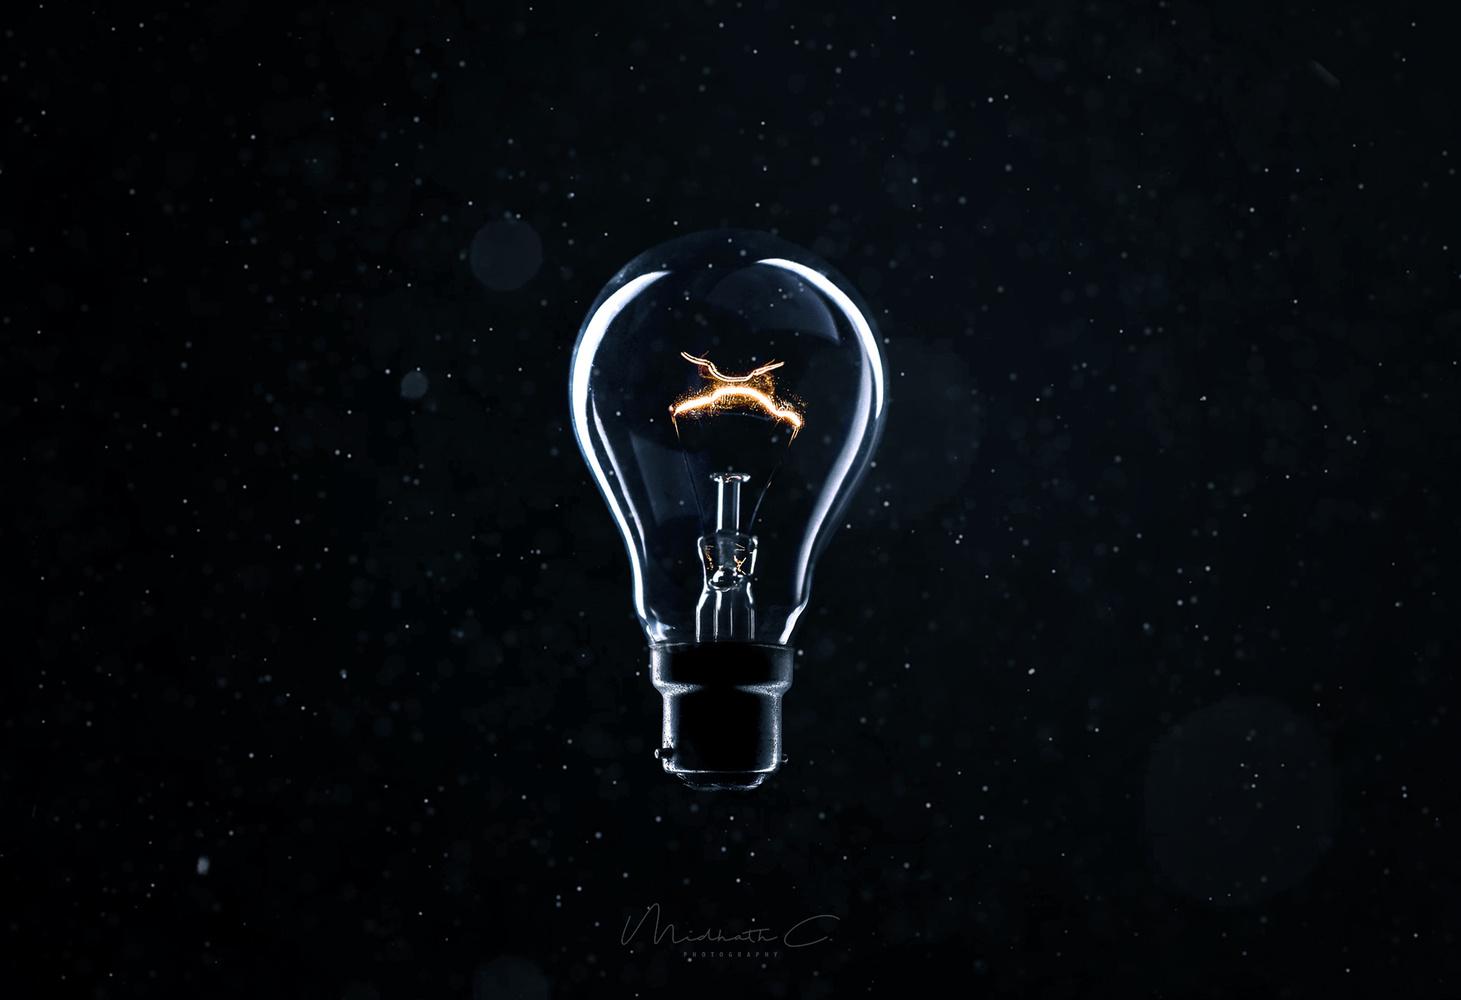 The Light Bulb by Midhath Chowdhury